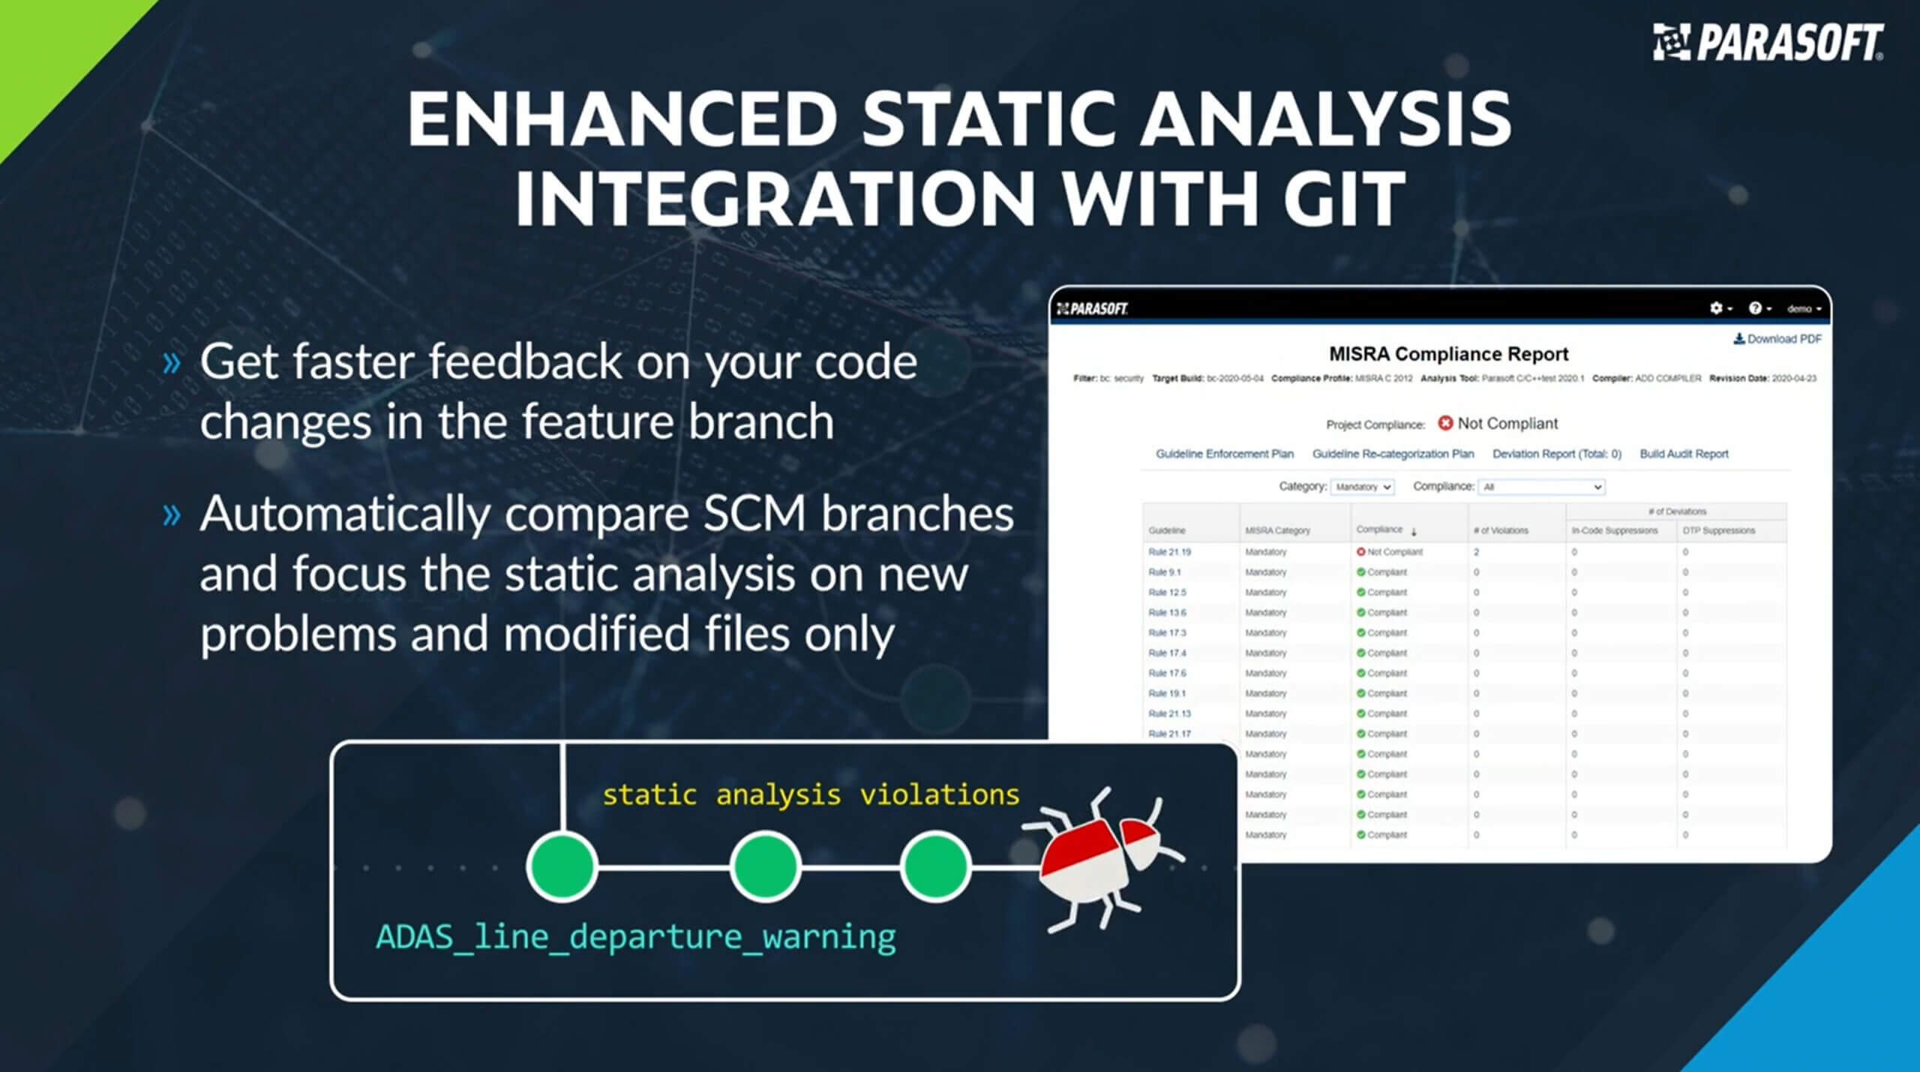 Slide titled Enhanced Static Analysis Integration With Git showing ADAS_line_departure_warning